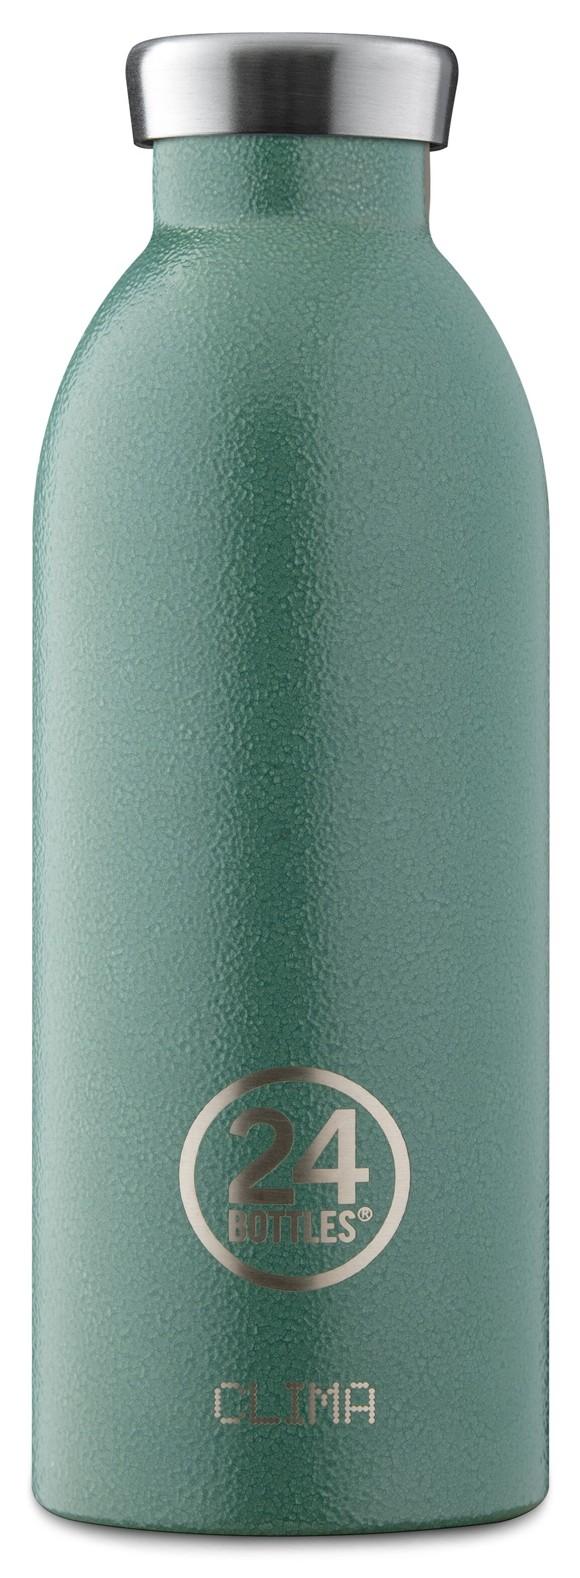 24 Bottles - Clima Bottle 0,5 L - Rustic Moss Green (24B157)